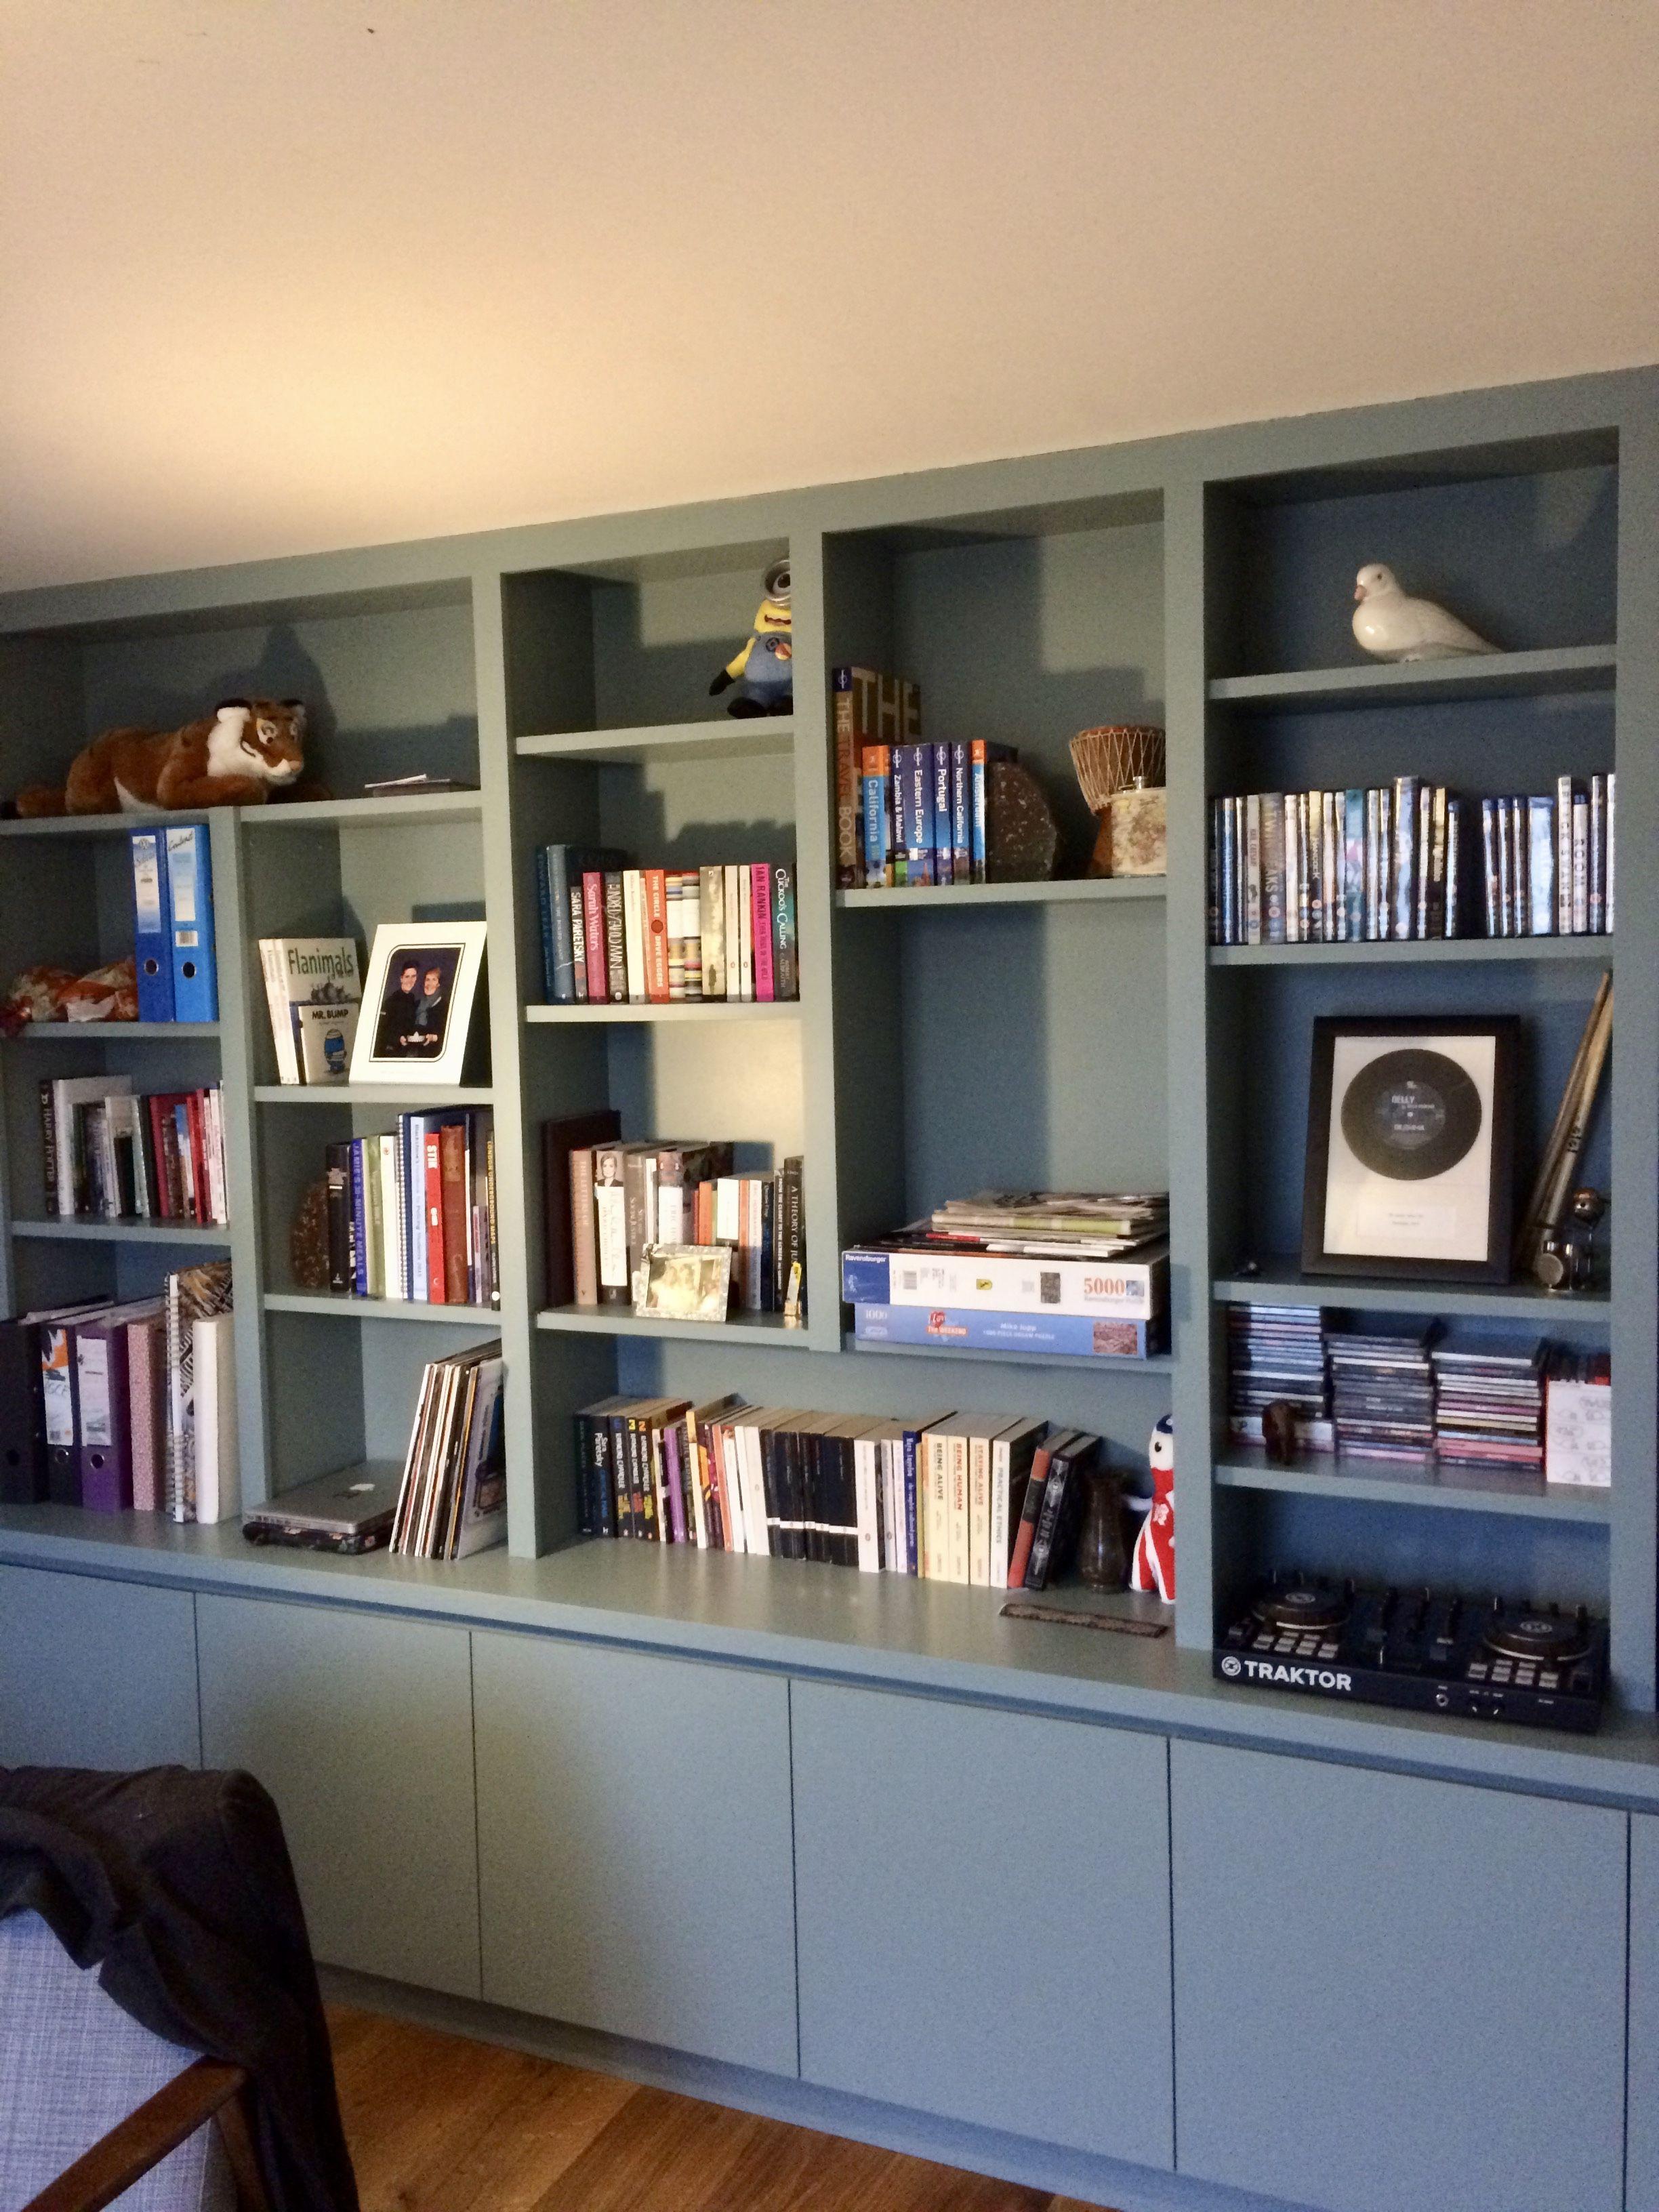 Smart Stylish Contemporary Bookcase Providing Plenty Of Library Shelving And Hidd Shelving Units Living Room Contemporary Bookcase Built In Shelves Living Room Living room bookshelf wall